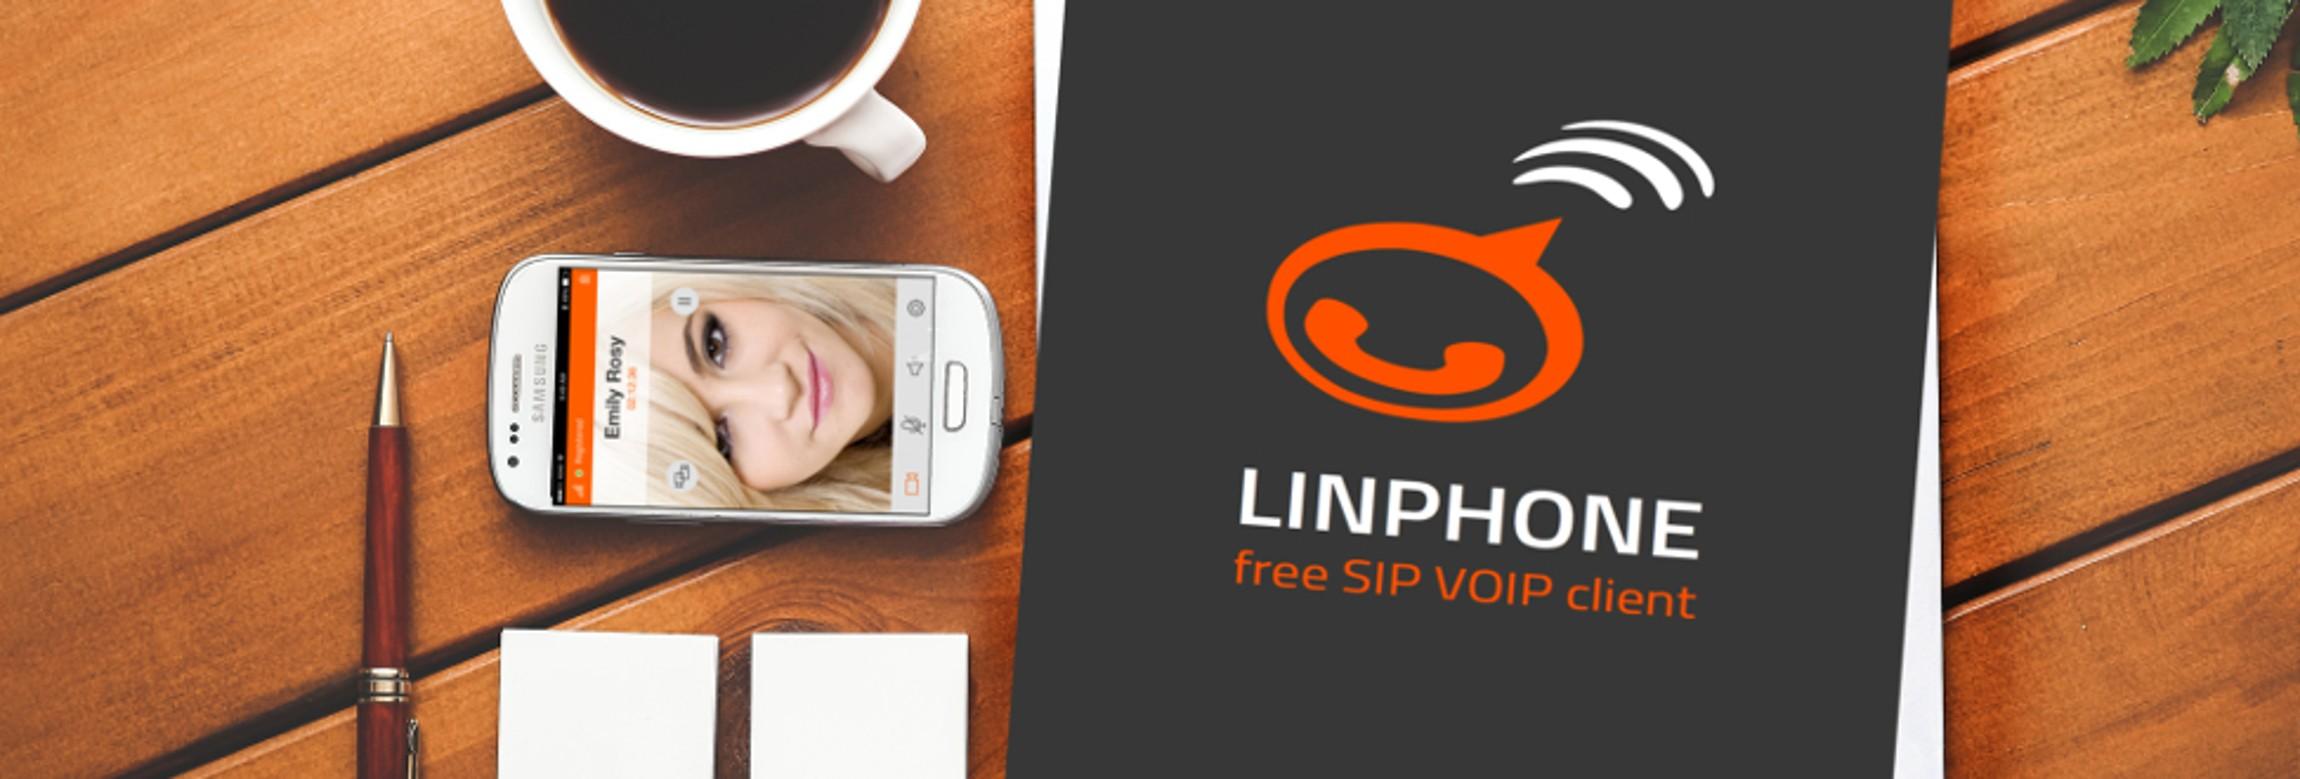 Linphone | LinkedIn